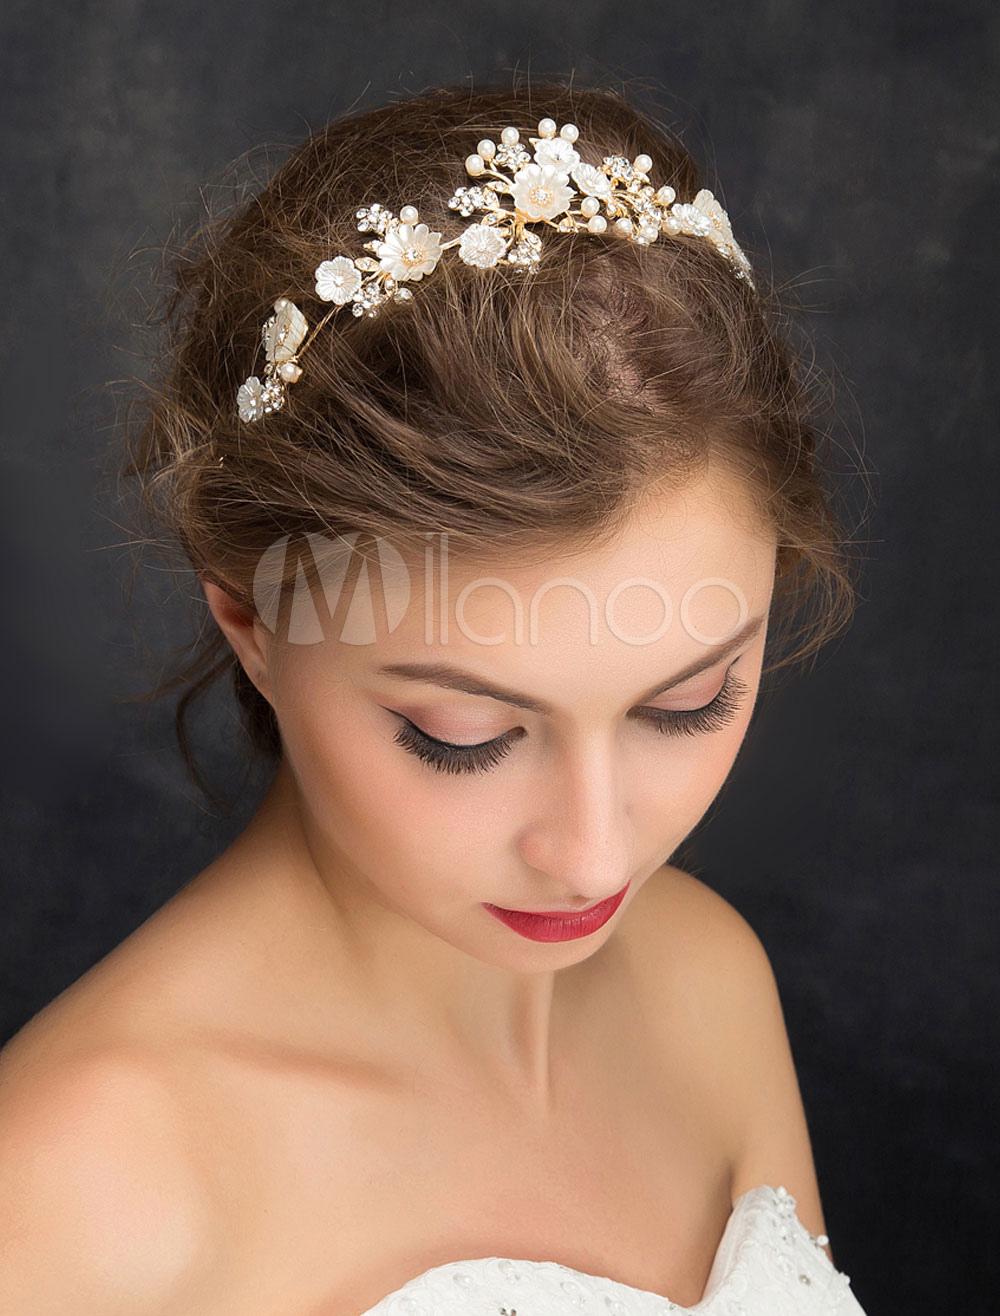 Wedding Hair Headband Gold Imitation Pearls Flowers Zirconia Bridal Headpiece